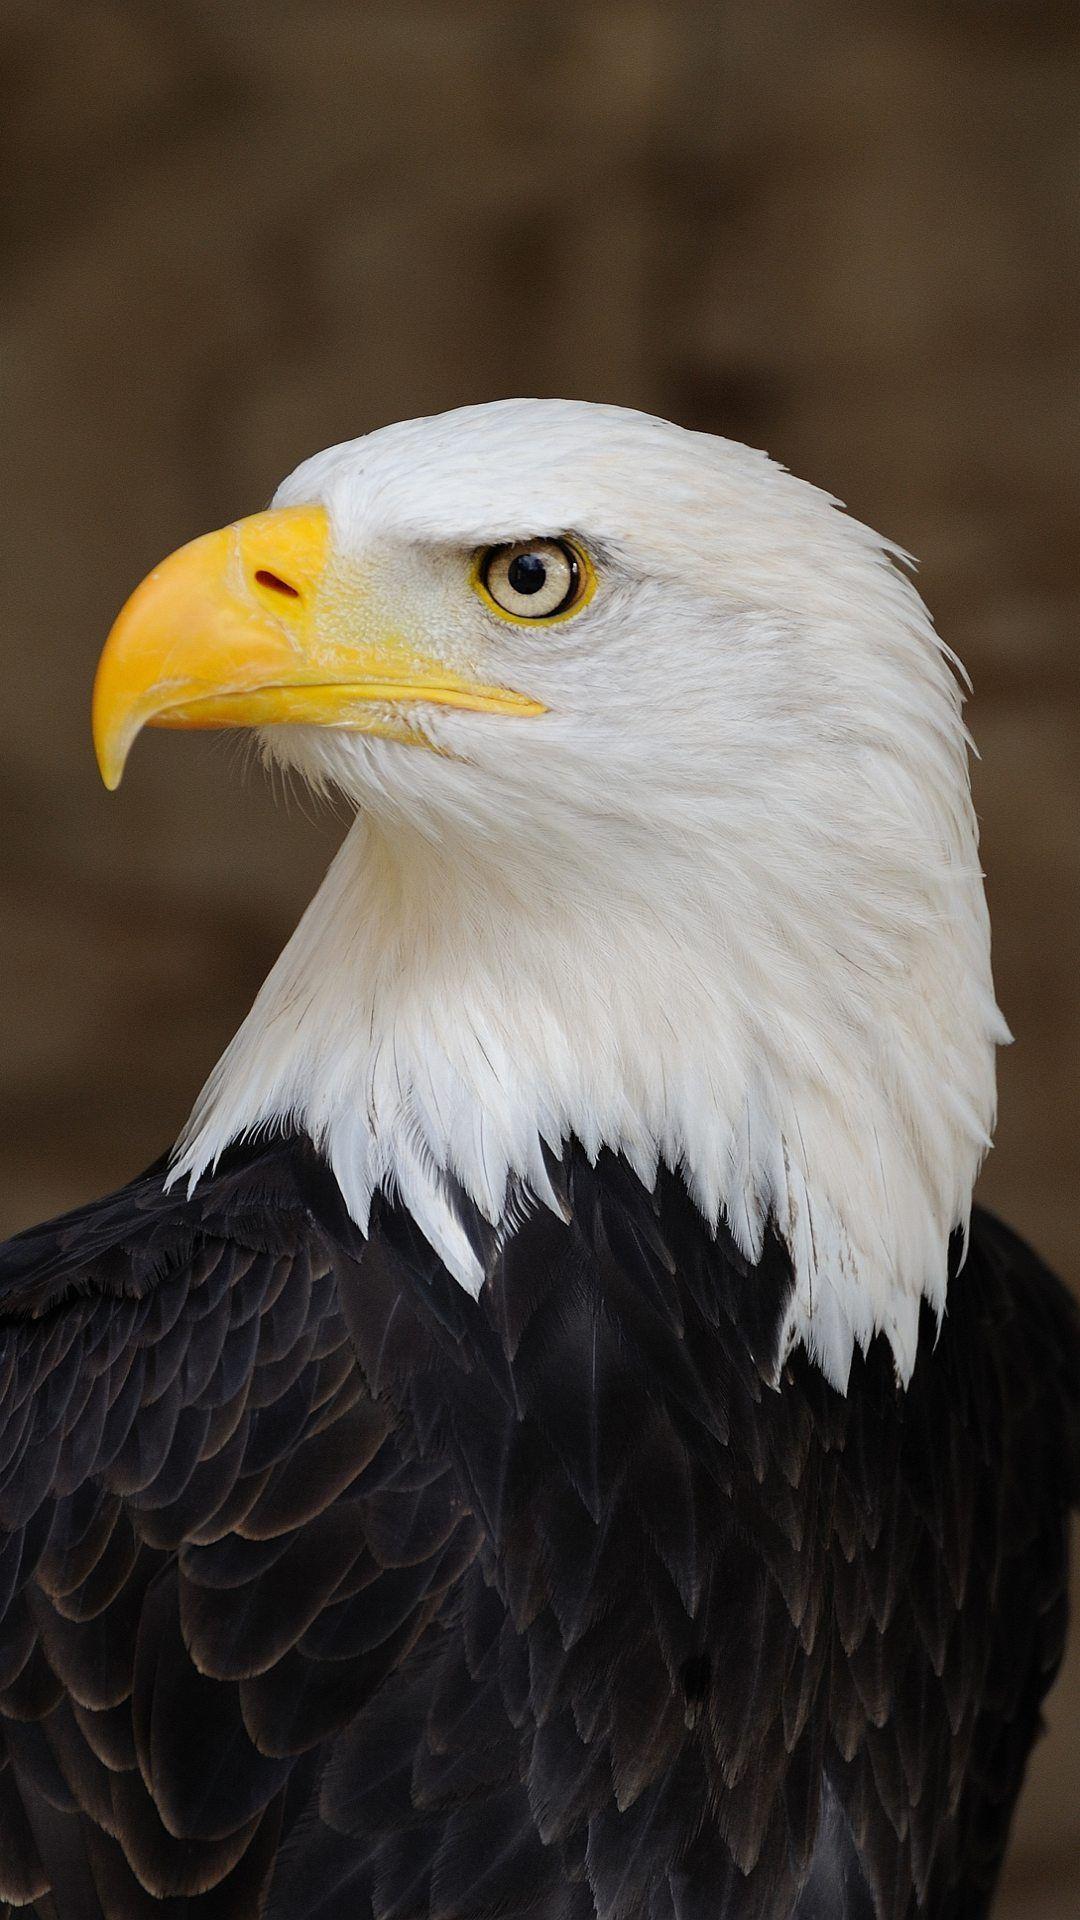 Wallpaper full hd 1080 x 1920 smartphone eagle america